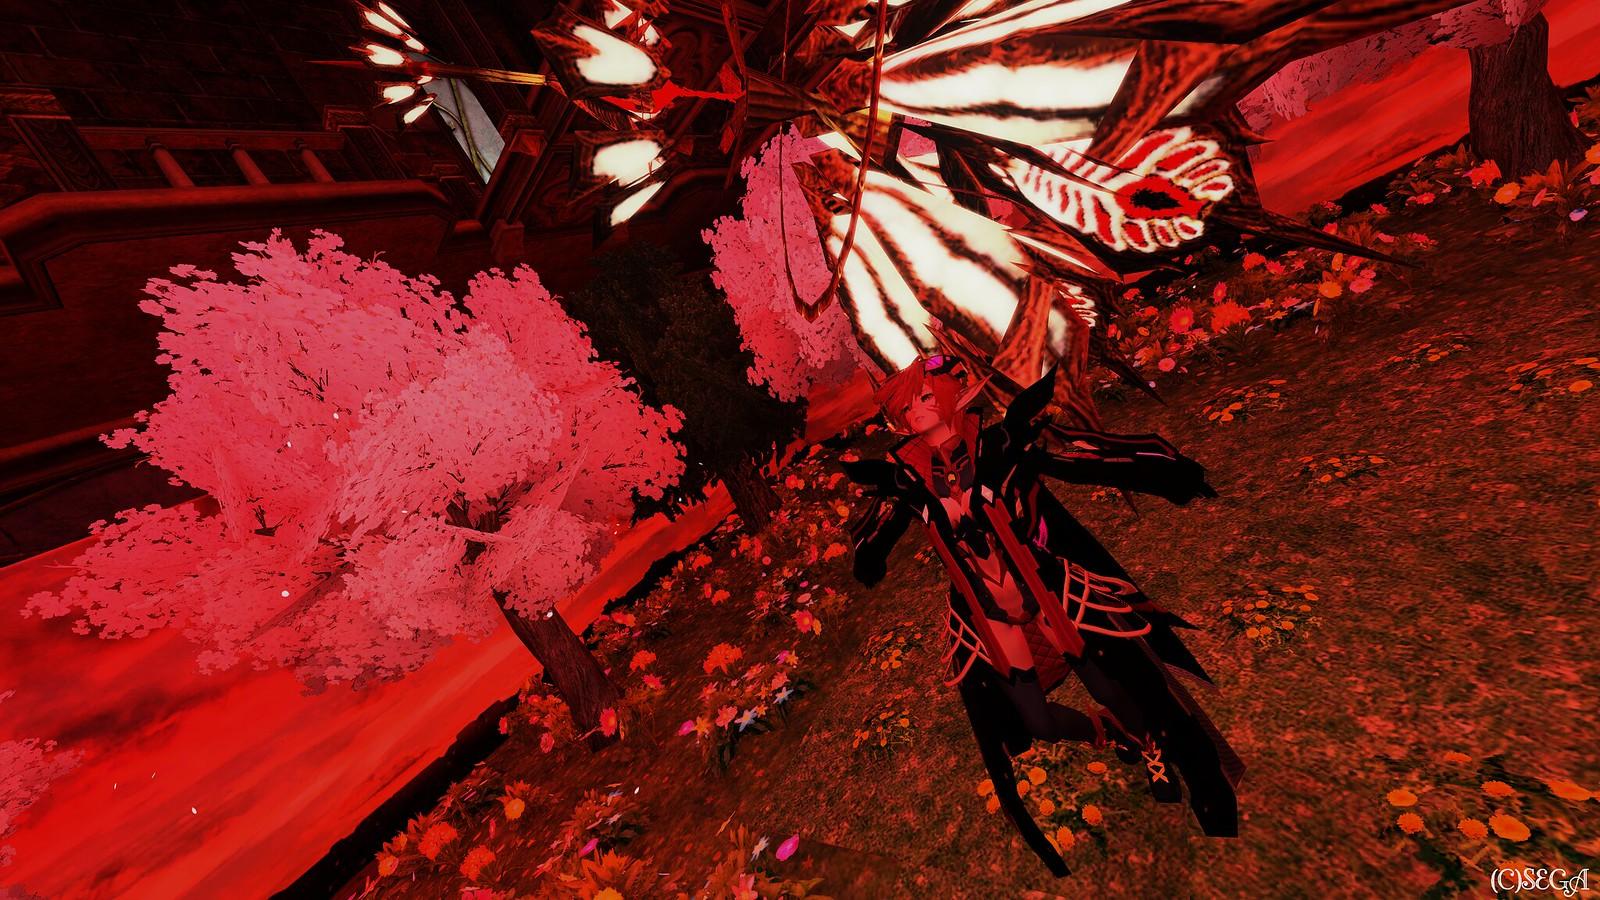 Phantasy Star Online 2 Screenshot 2020.05.16 - 23.32.29.62